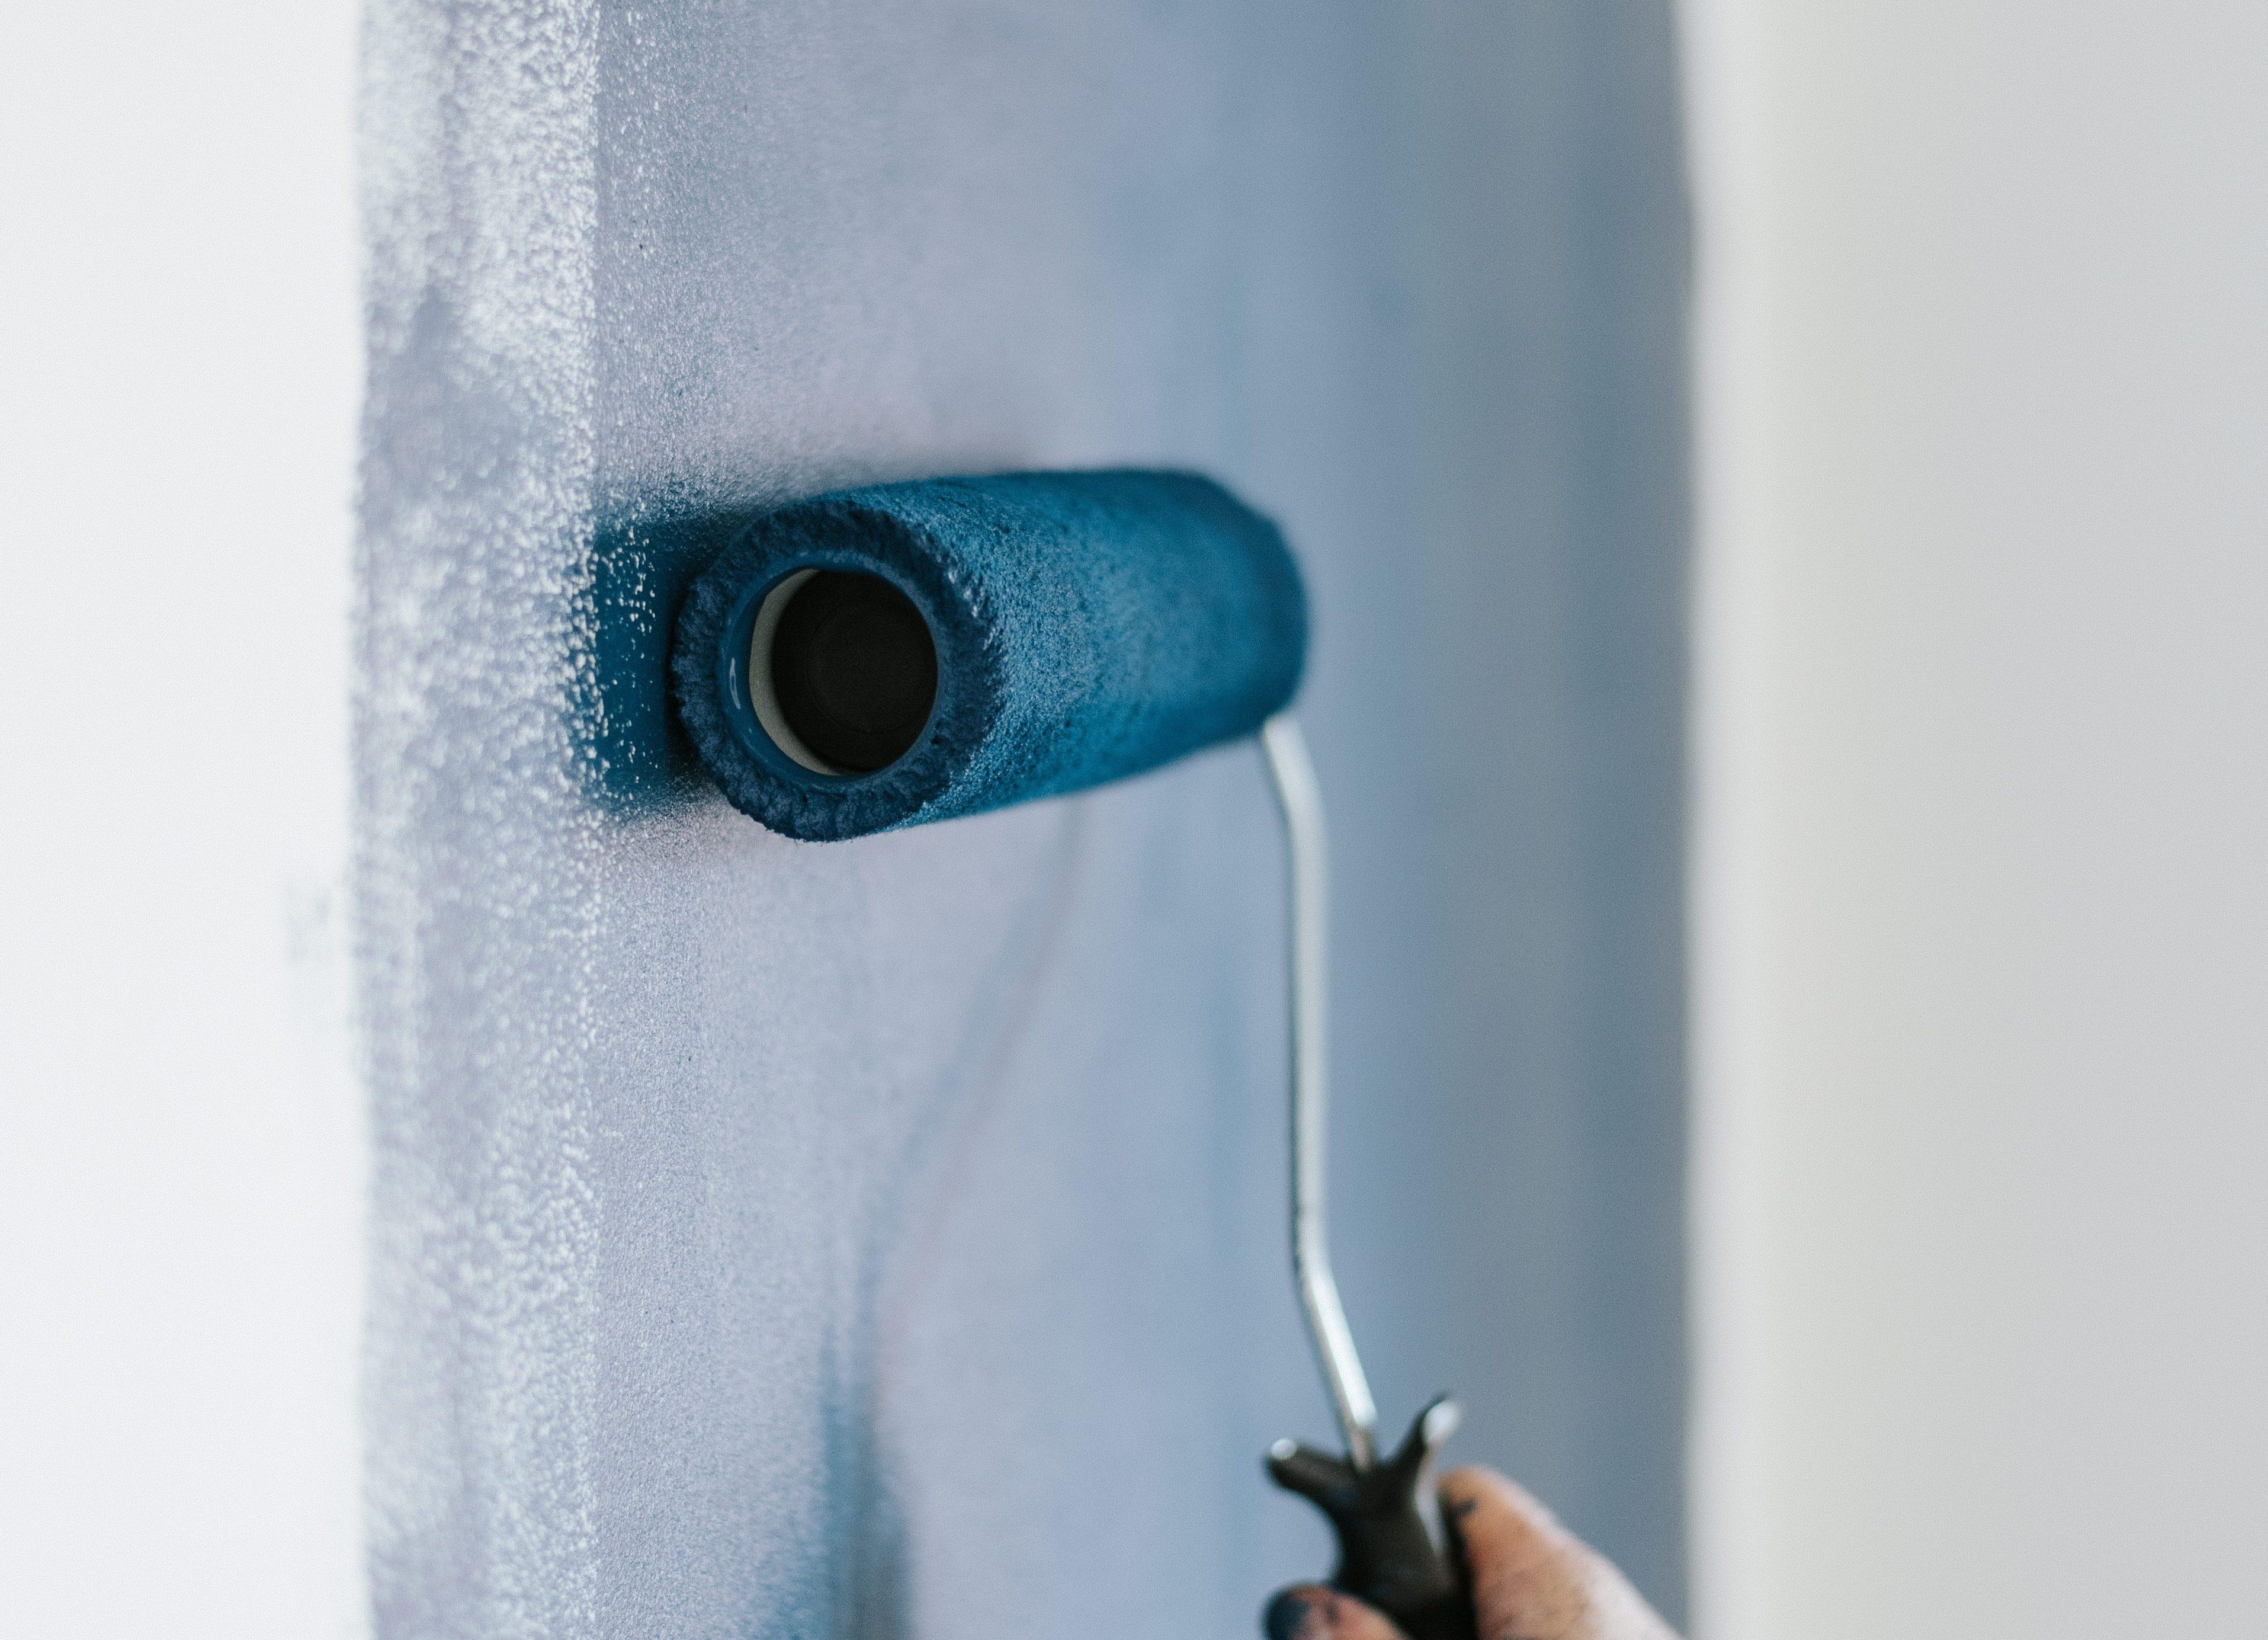 _villa_renovations_algarve_painting_decorating_contractor_algarve_home_improvements_ 1